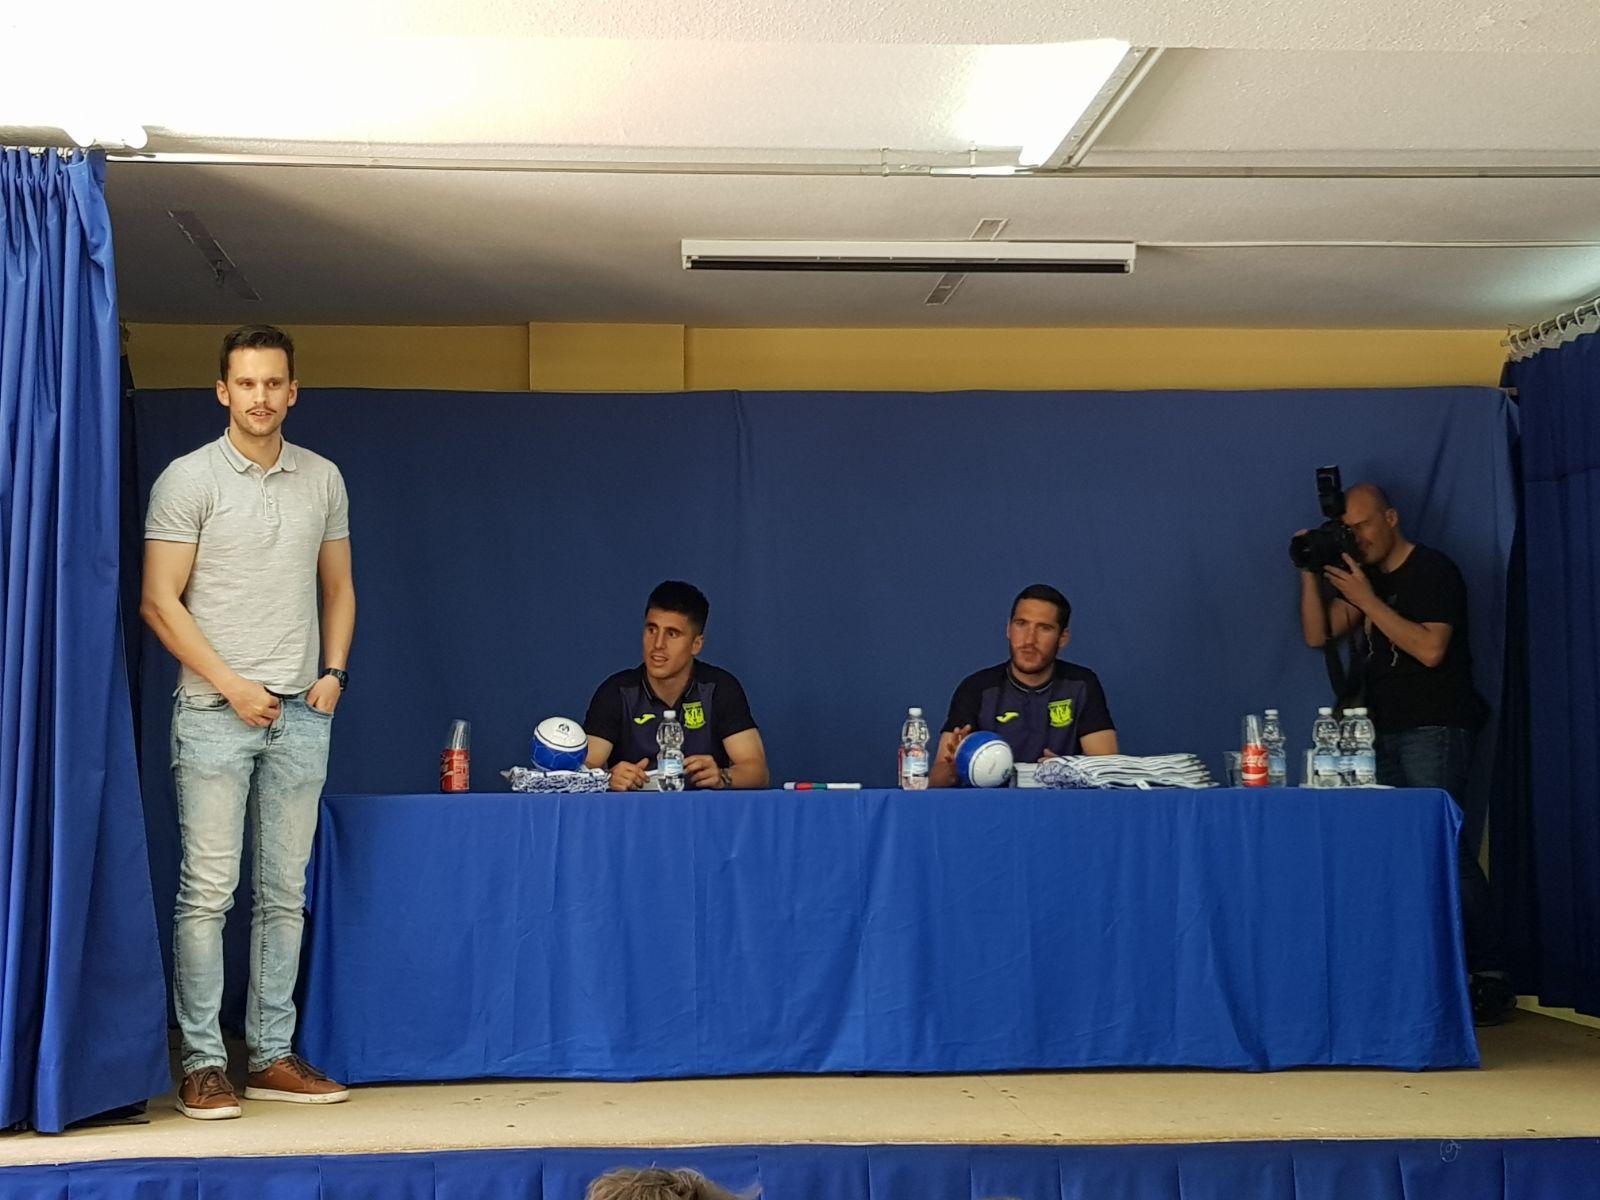 Los jugadores del C.F. Leganés visitan el cole